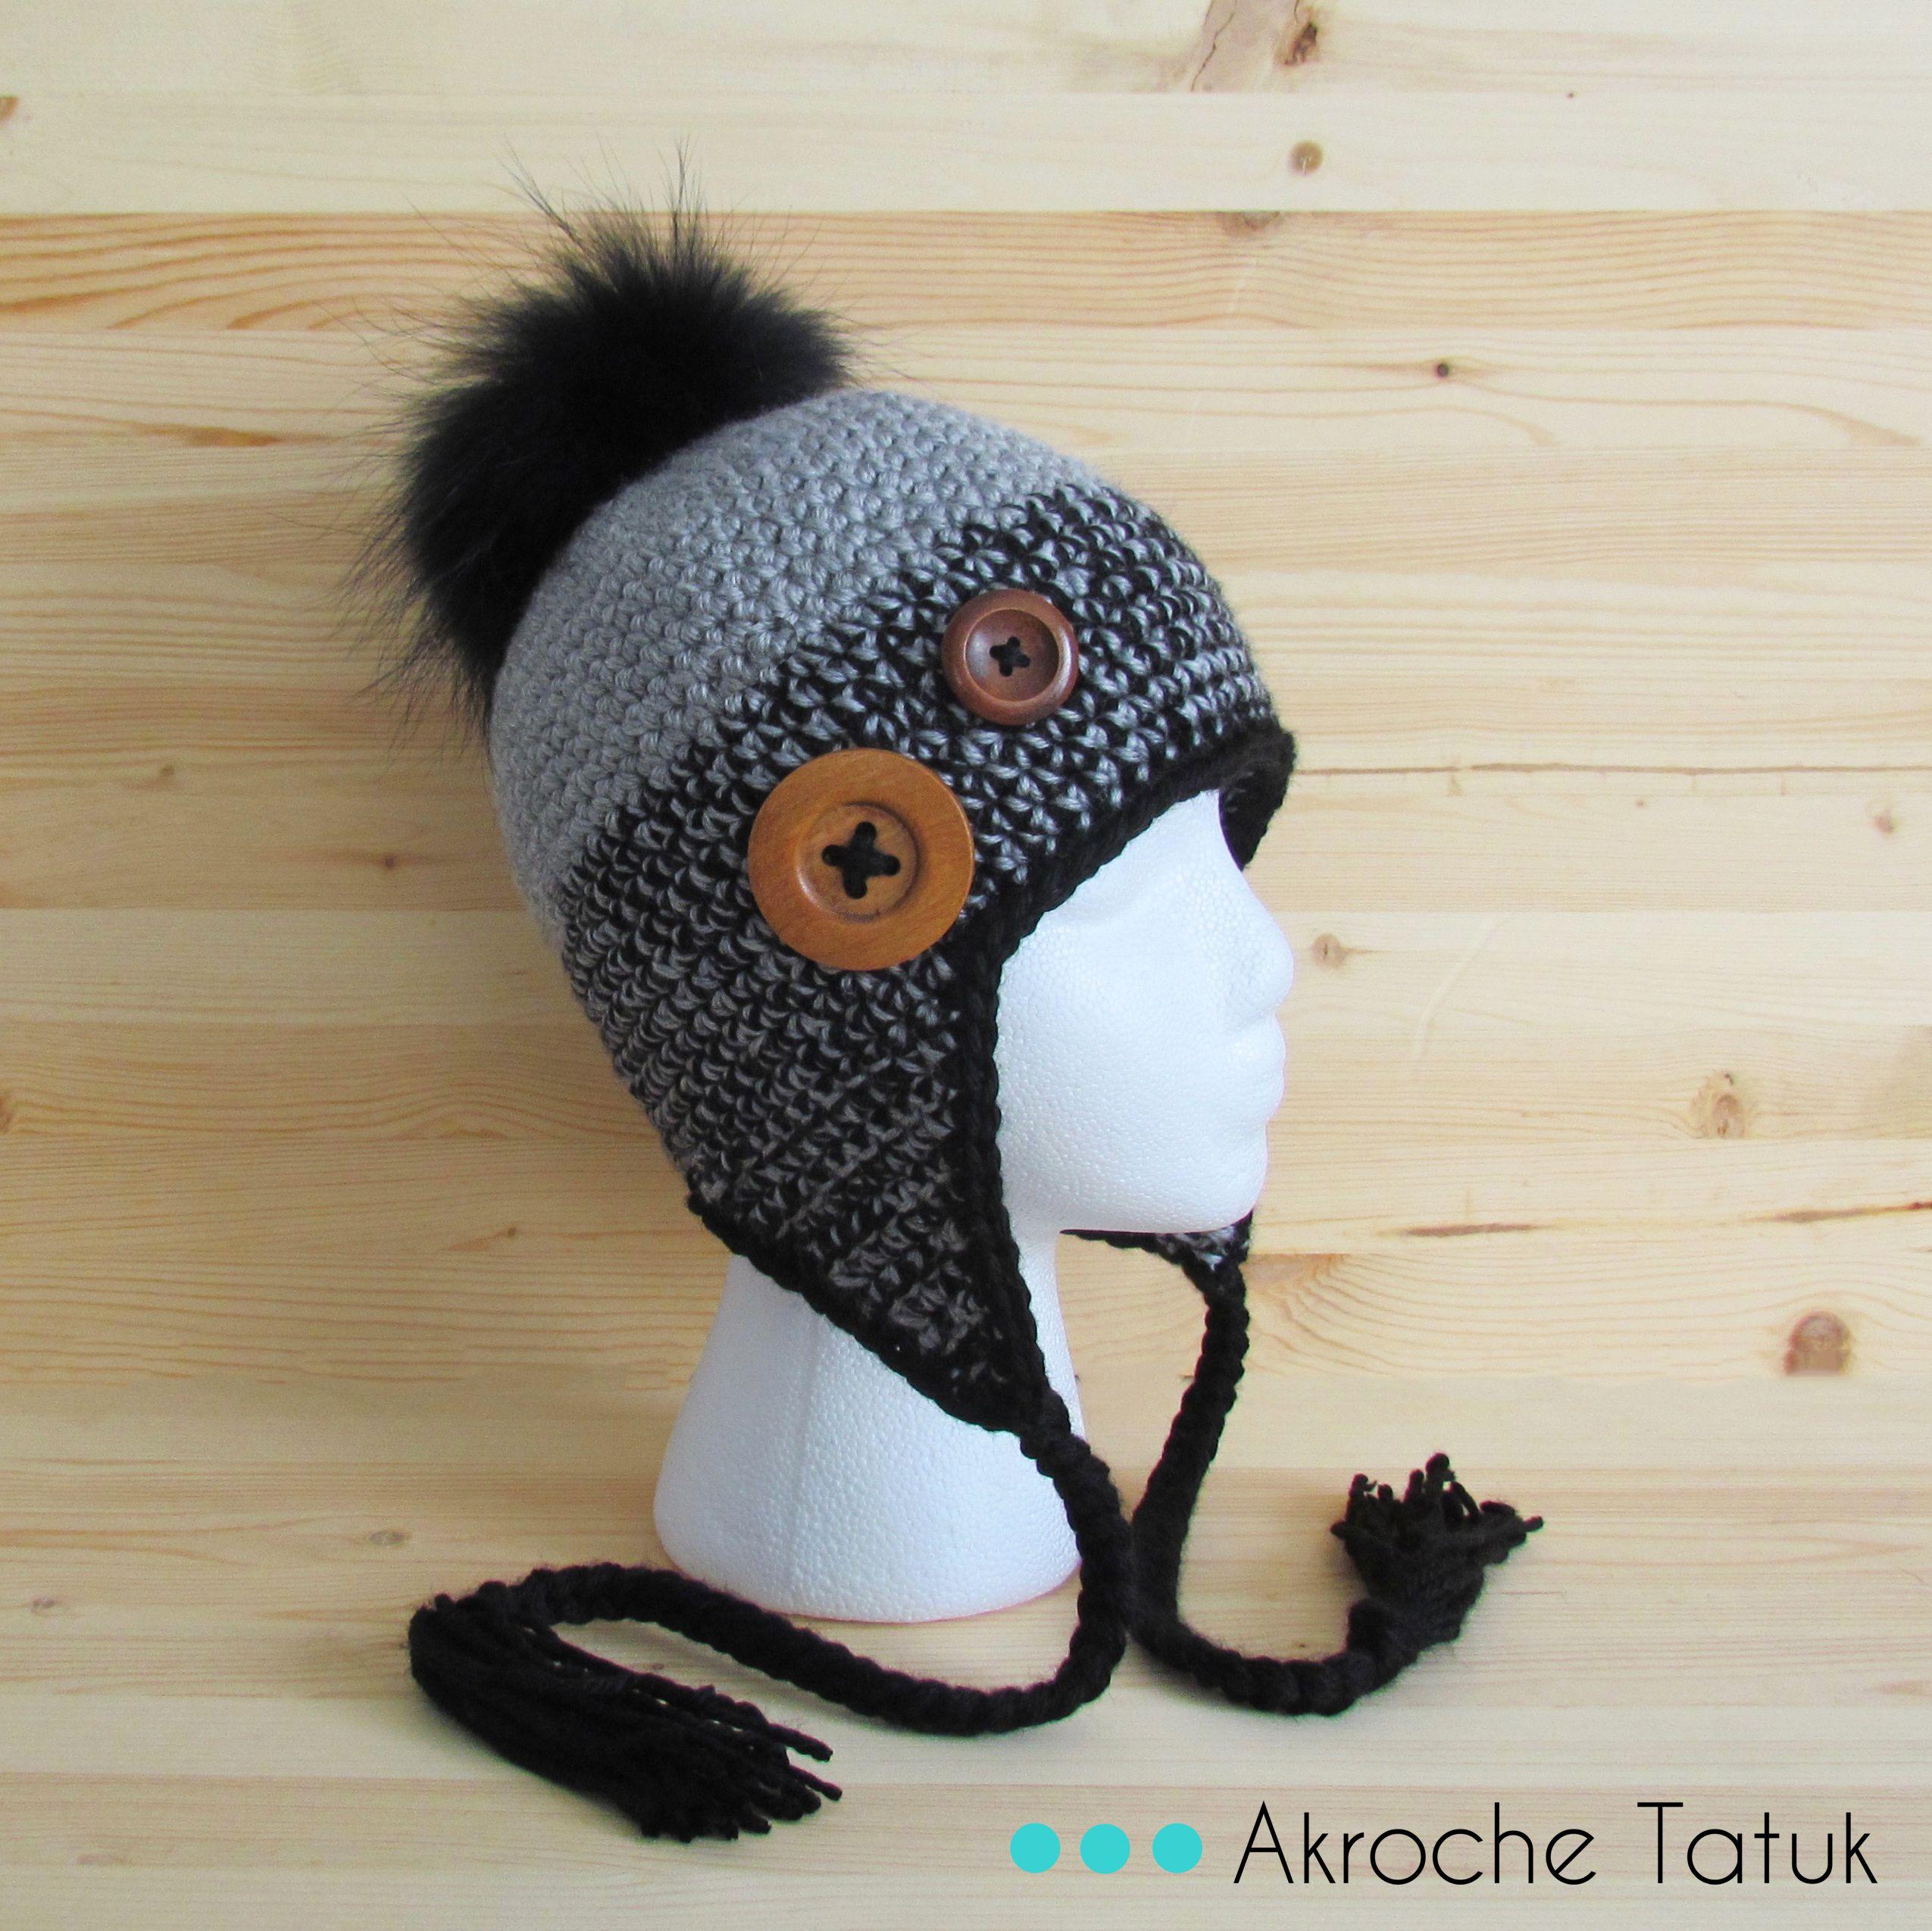 Nunavut Kit/ Ensemble Nunavut pattern by Akroche Tatuk